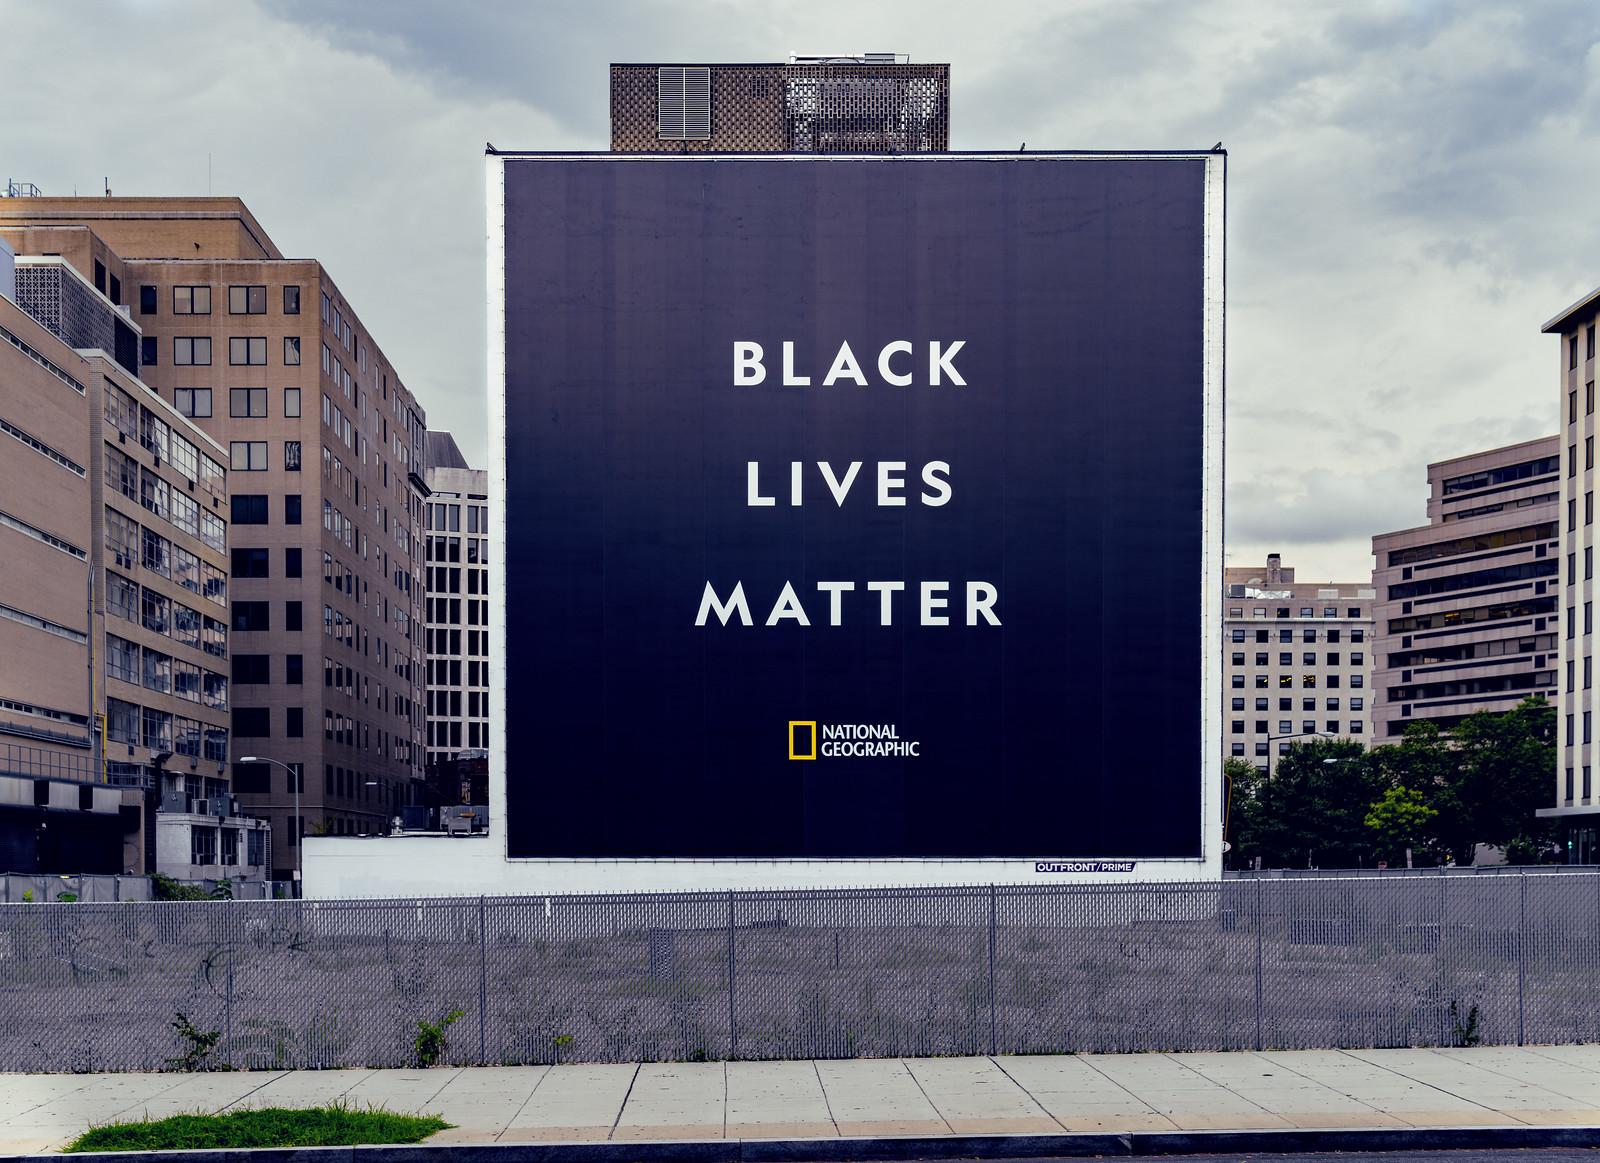 Photo Friday: Black Lives Matter, Washington, DC USA